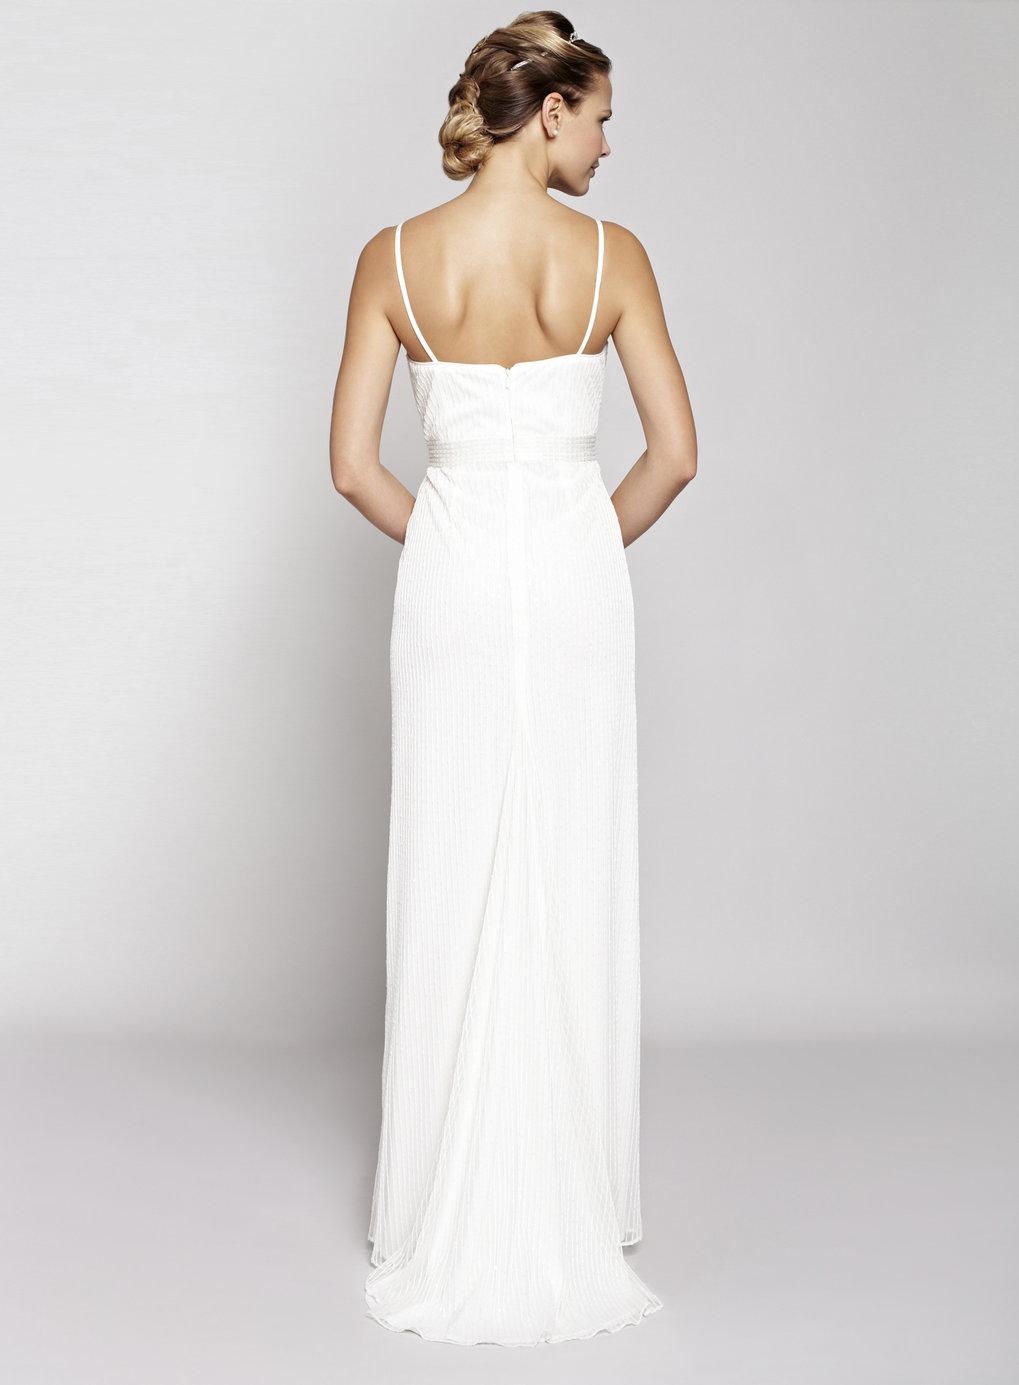 BHS On Sale Juliet Wedding Gowns 2015 | bridal and wedding fashion